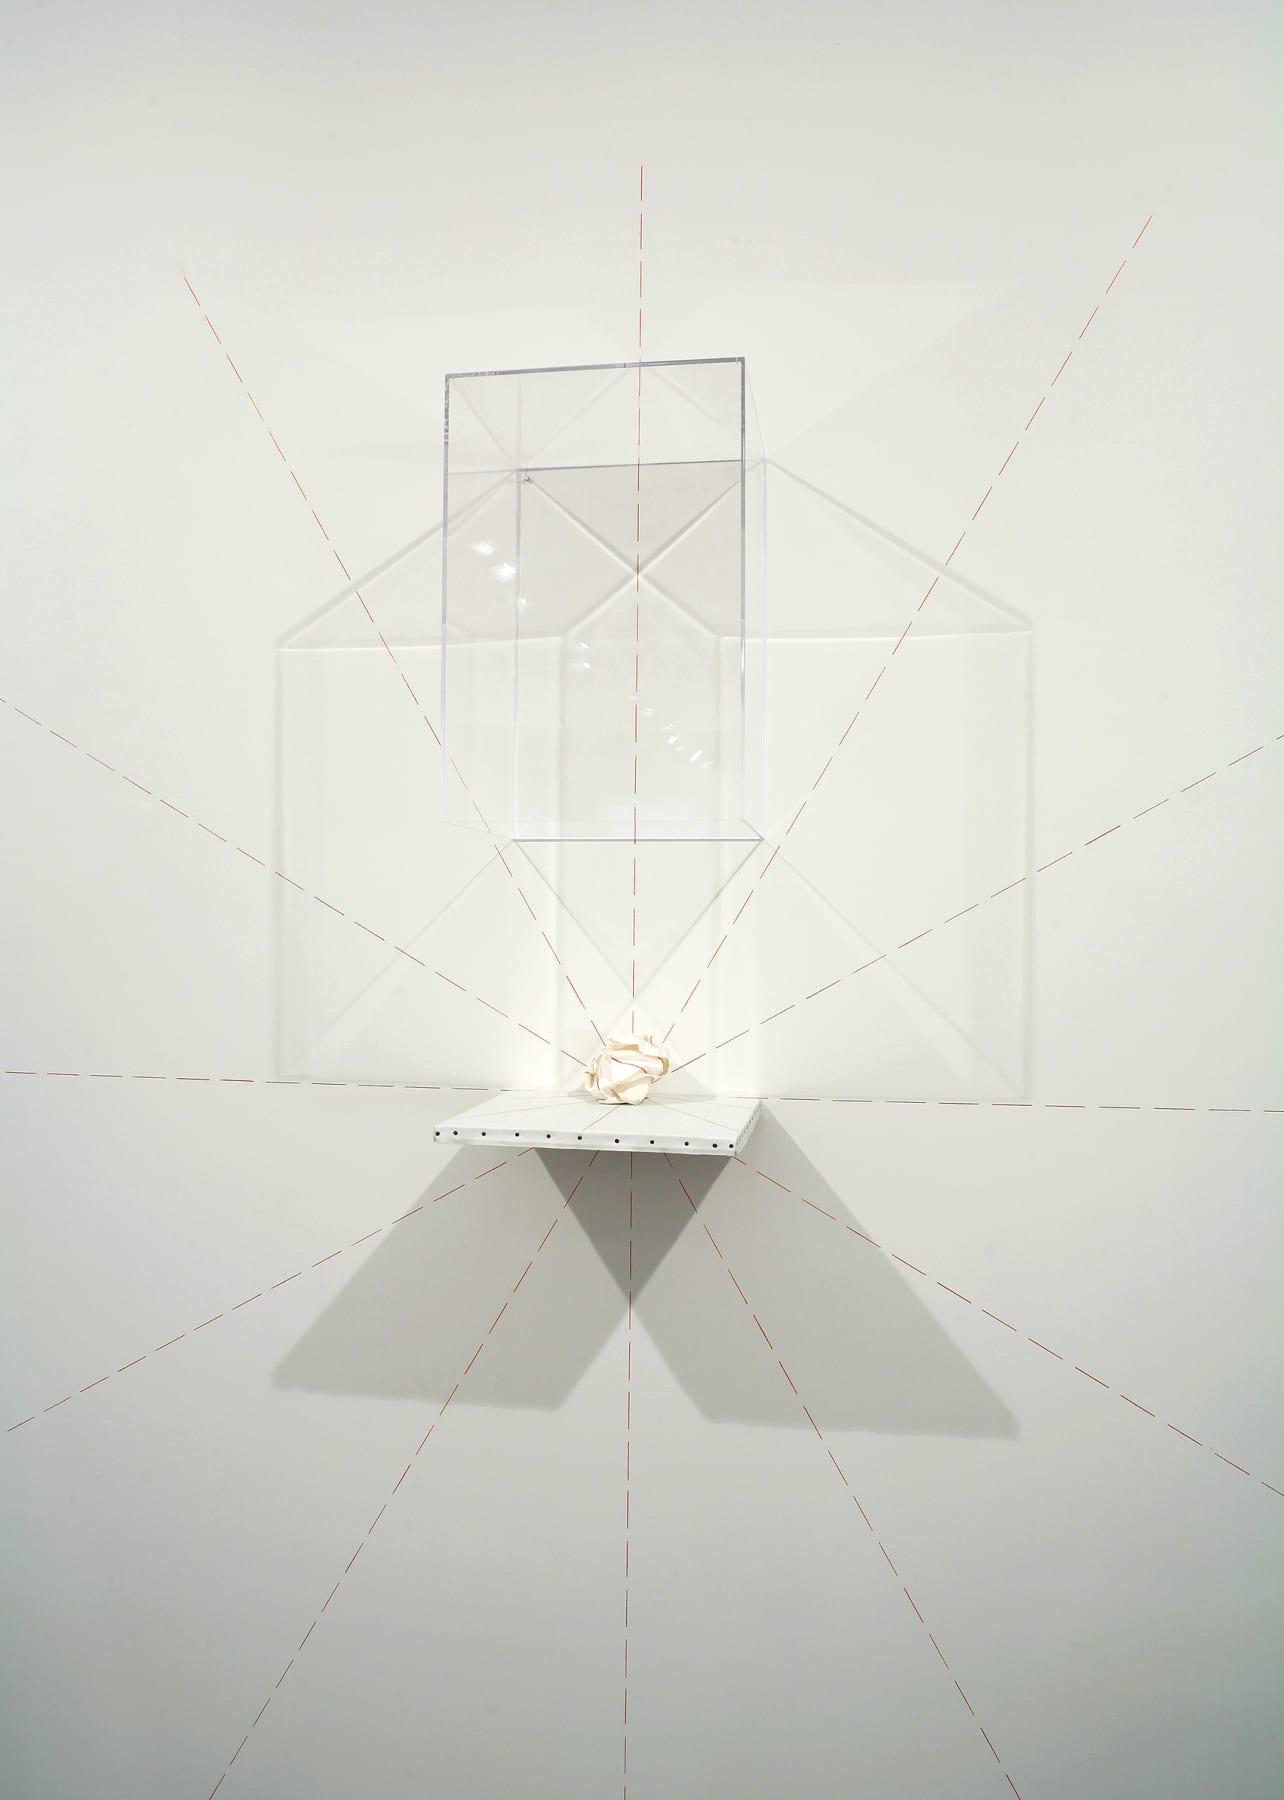 Giulio Paolini, Pesi e misure (Weights and Measures), 2006